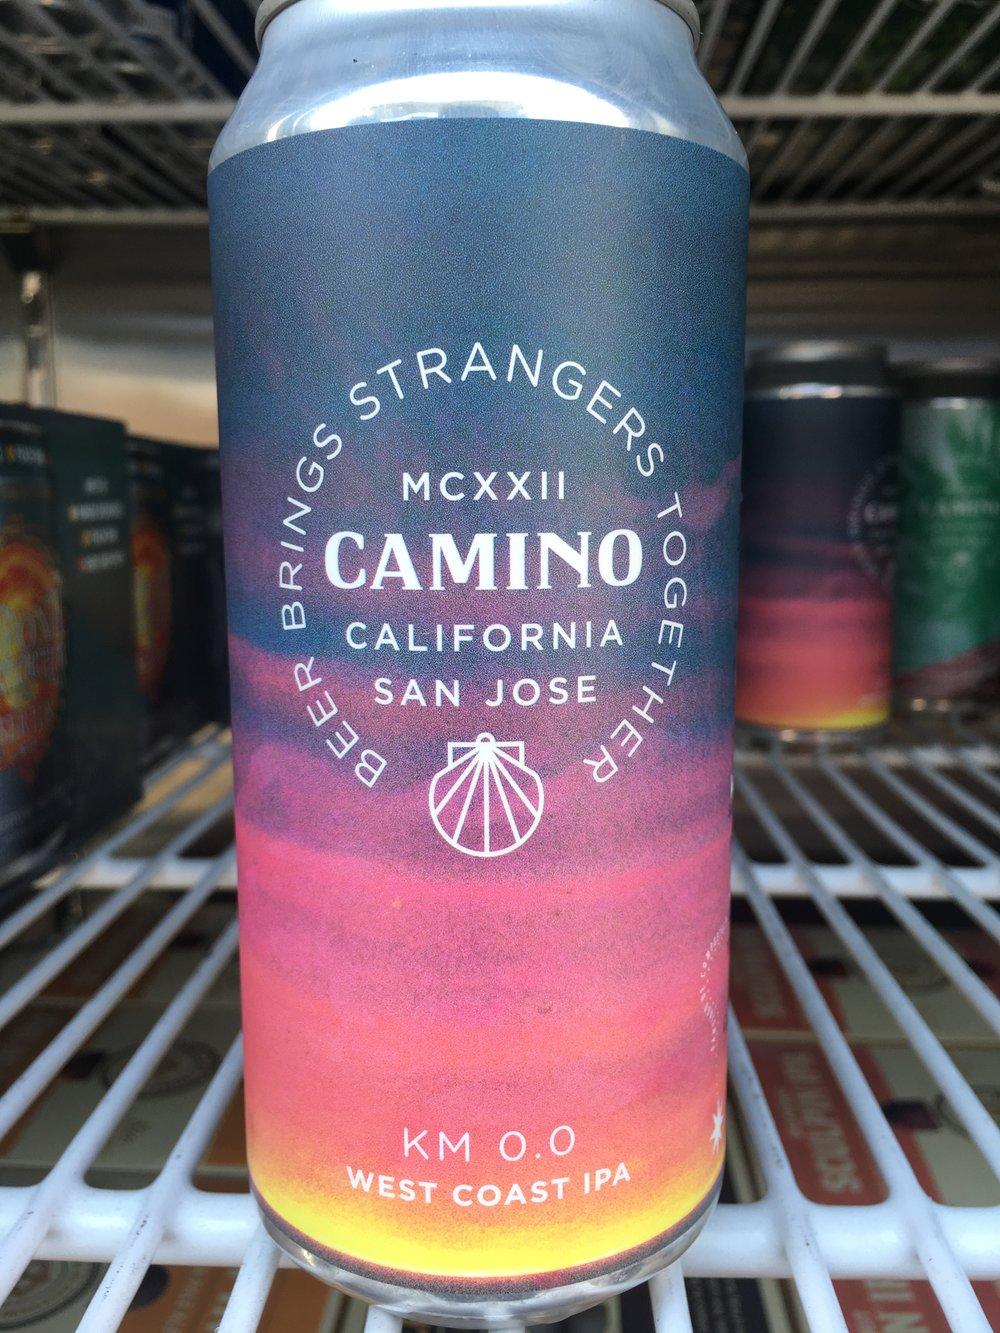 Camino Brewing - KM 0.0 West Coast IPA